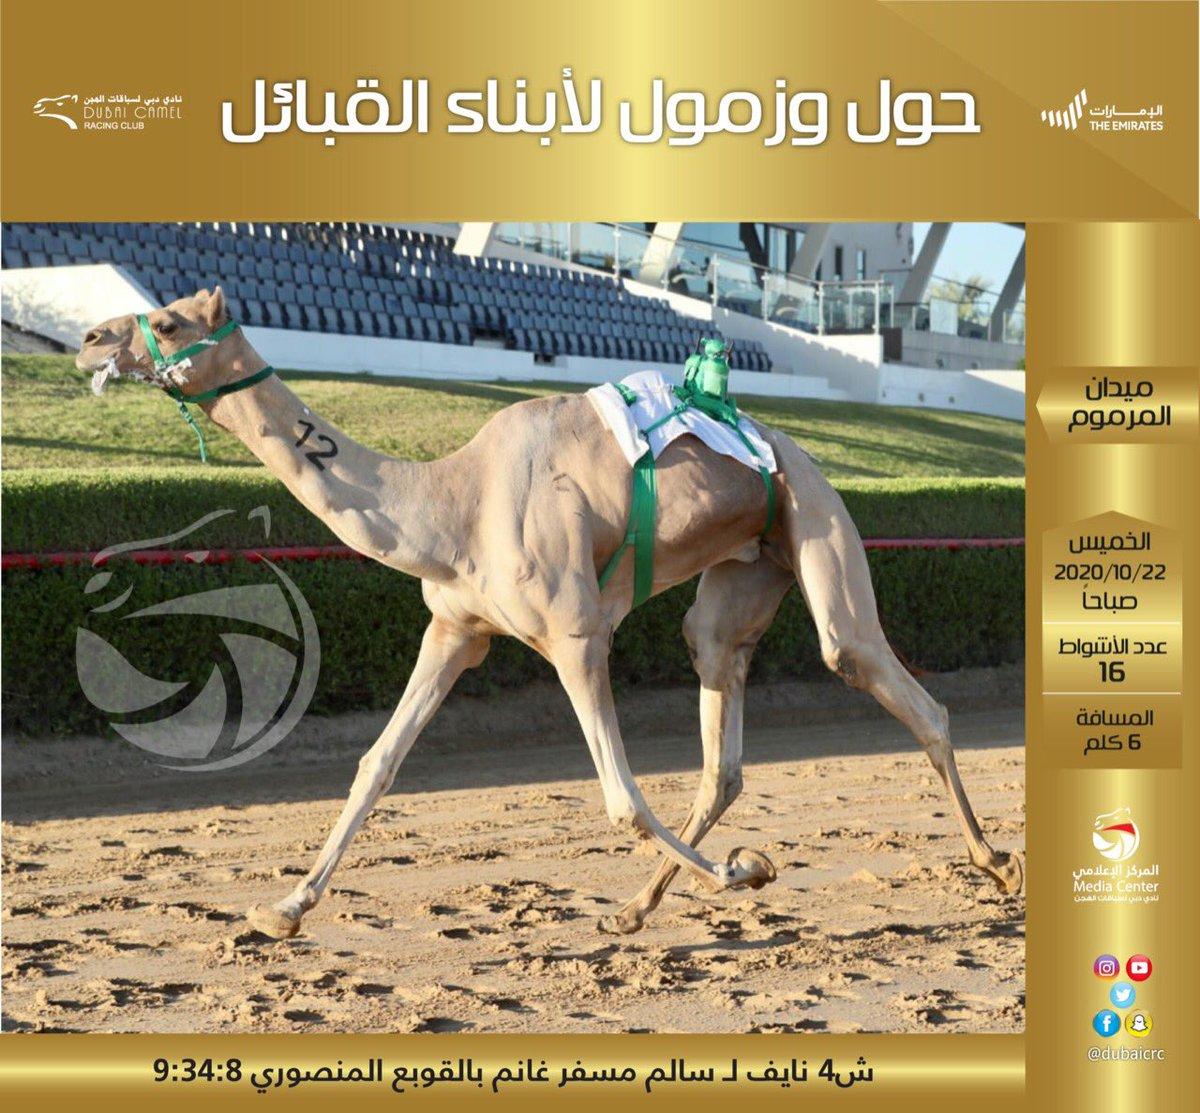 #الاصايل #نادي_دبي_لسباقات_الهجن #المركز_الاعلامي #فزاع #faz3  #almarmoom #Dubaicrc #camel #Racing_club #Dubai #VisitDubai  #uae #Camelrace #sports #fun #camels #heritage #race #tourism #emirates #photography #dubailife #DCRC #mydubai https://t.co/UAN0Z2wb9z